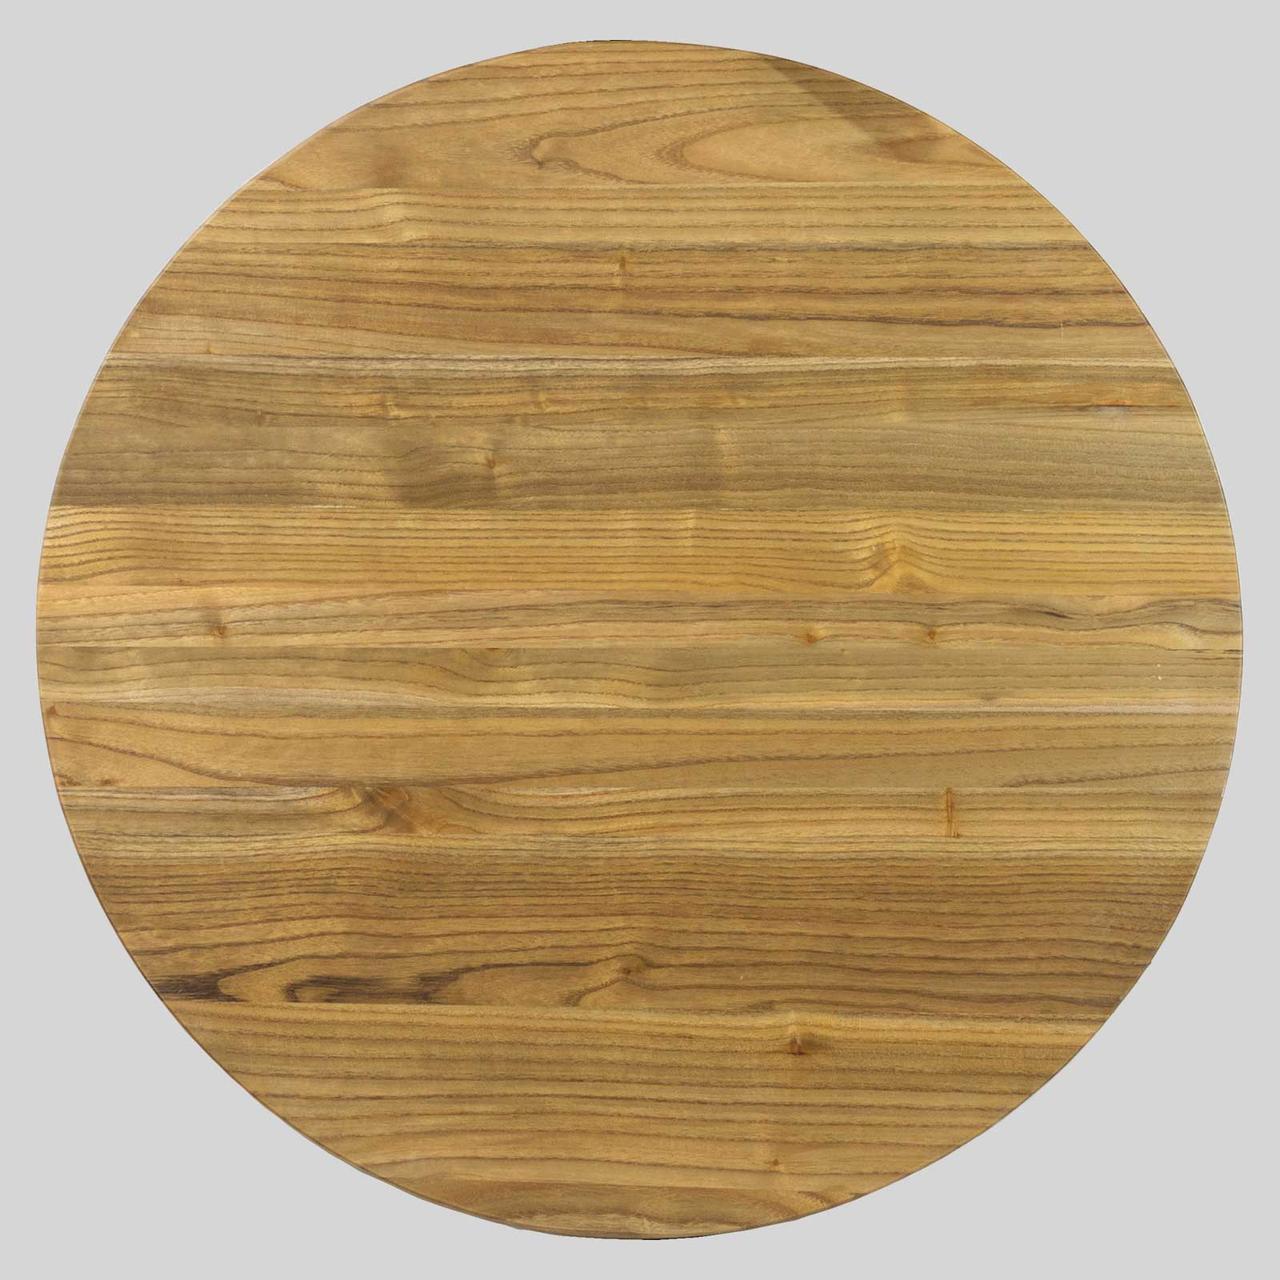 elm_timber_table_top_700dia_natural_t.jpg